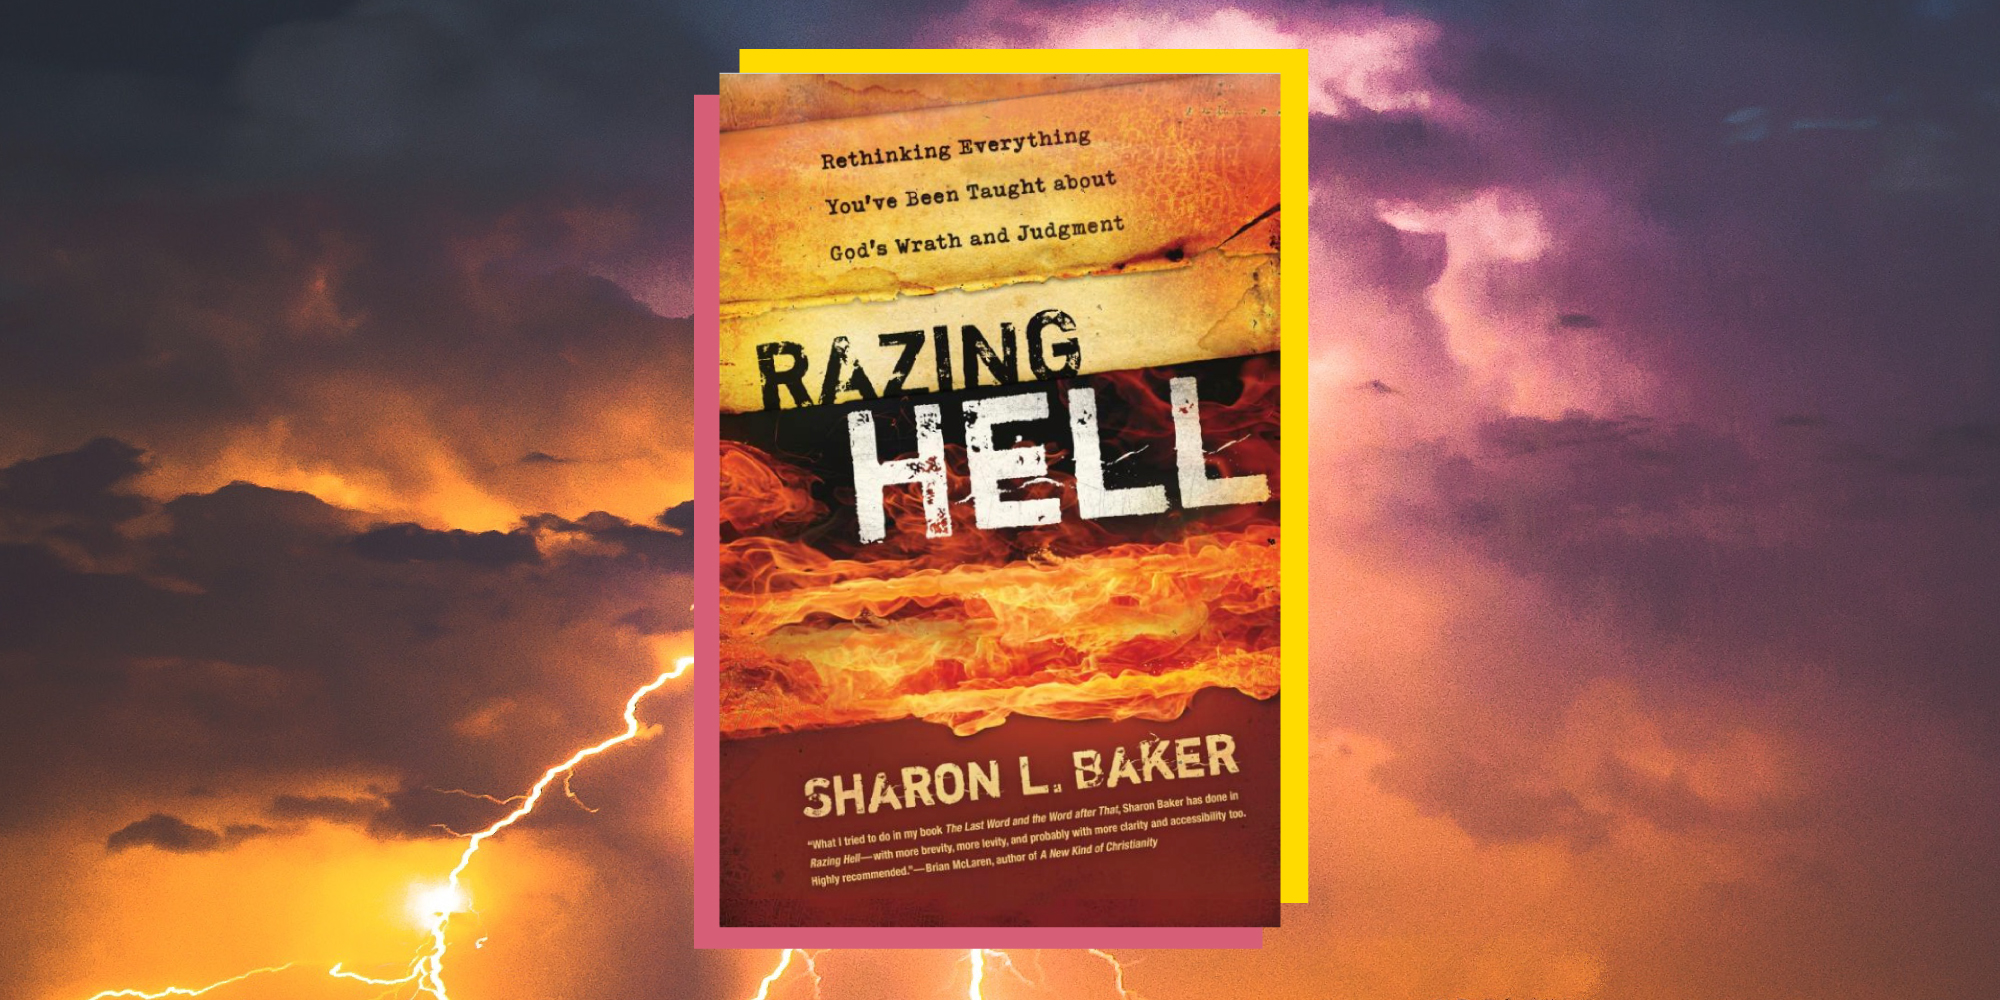 razing-hell-book-review-sharon-baker-bro-bear-blog.jpg